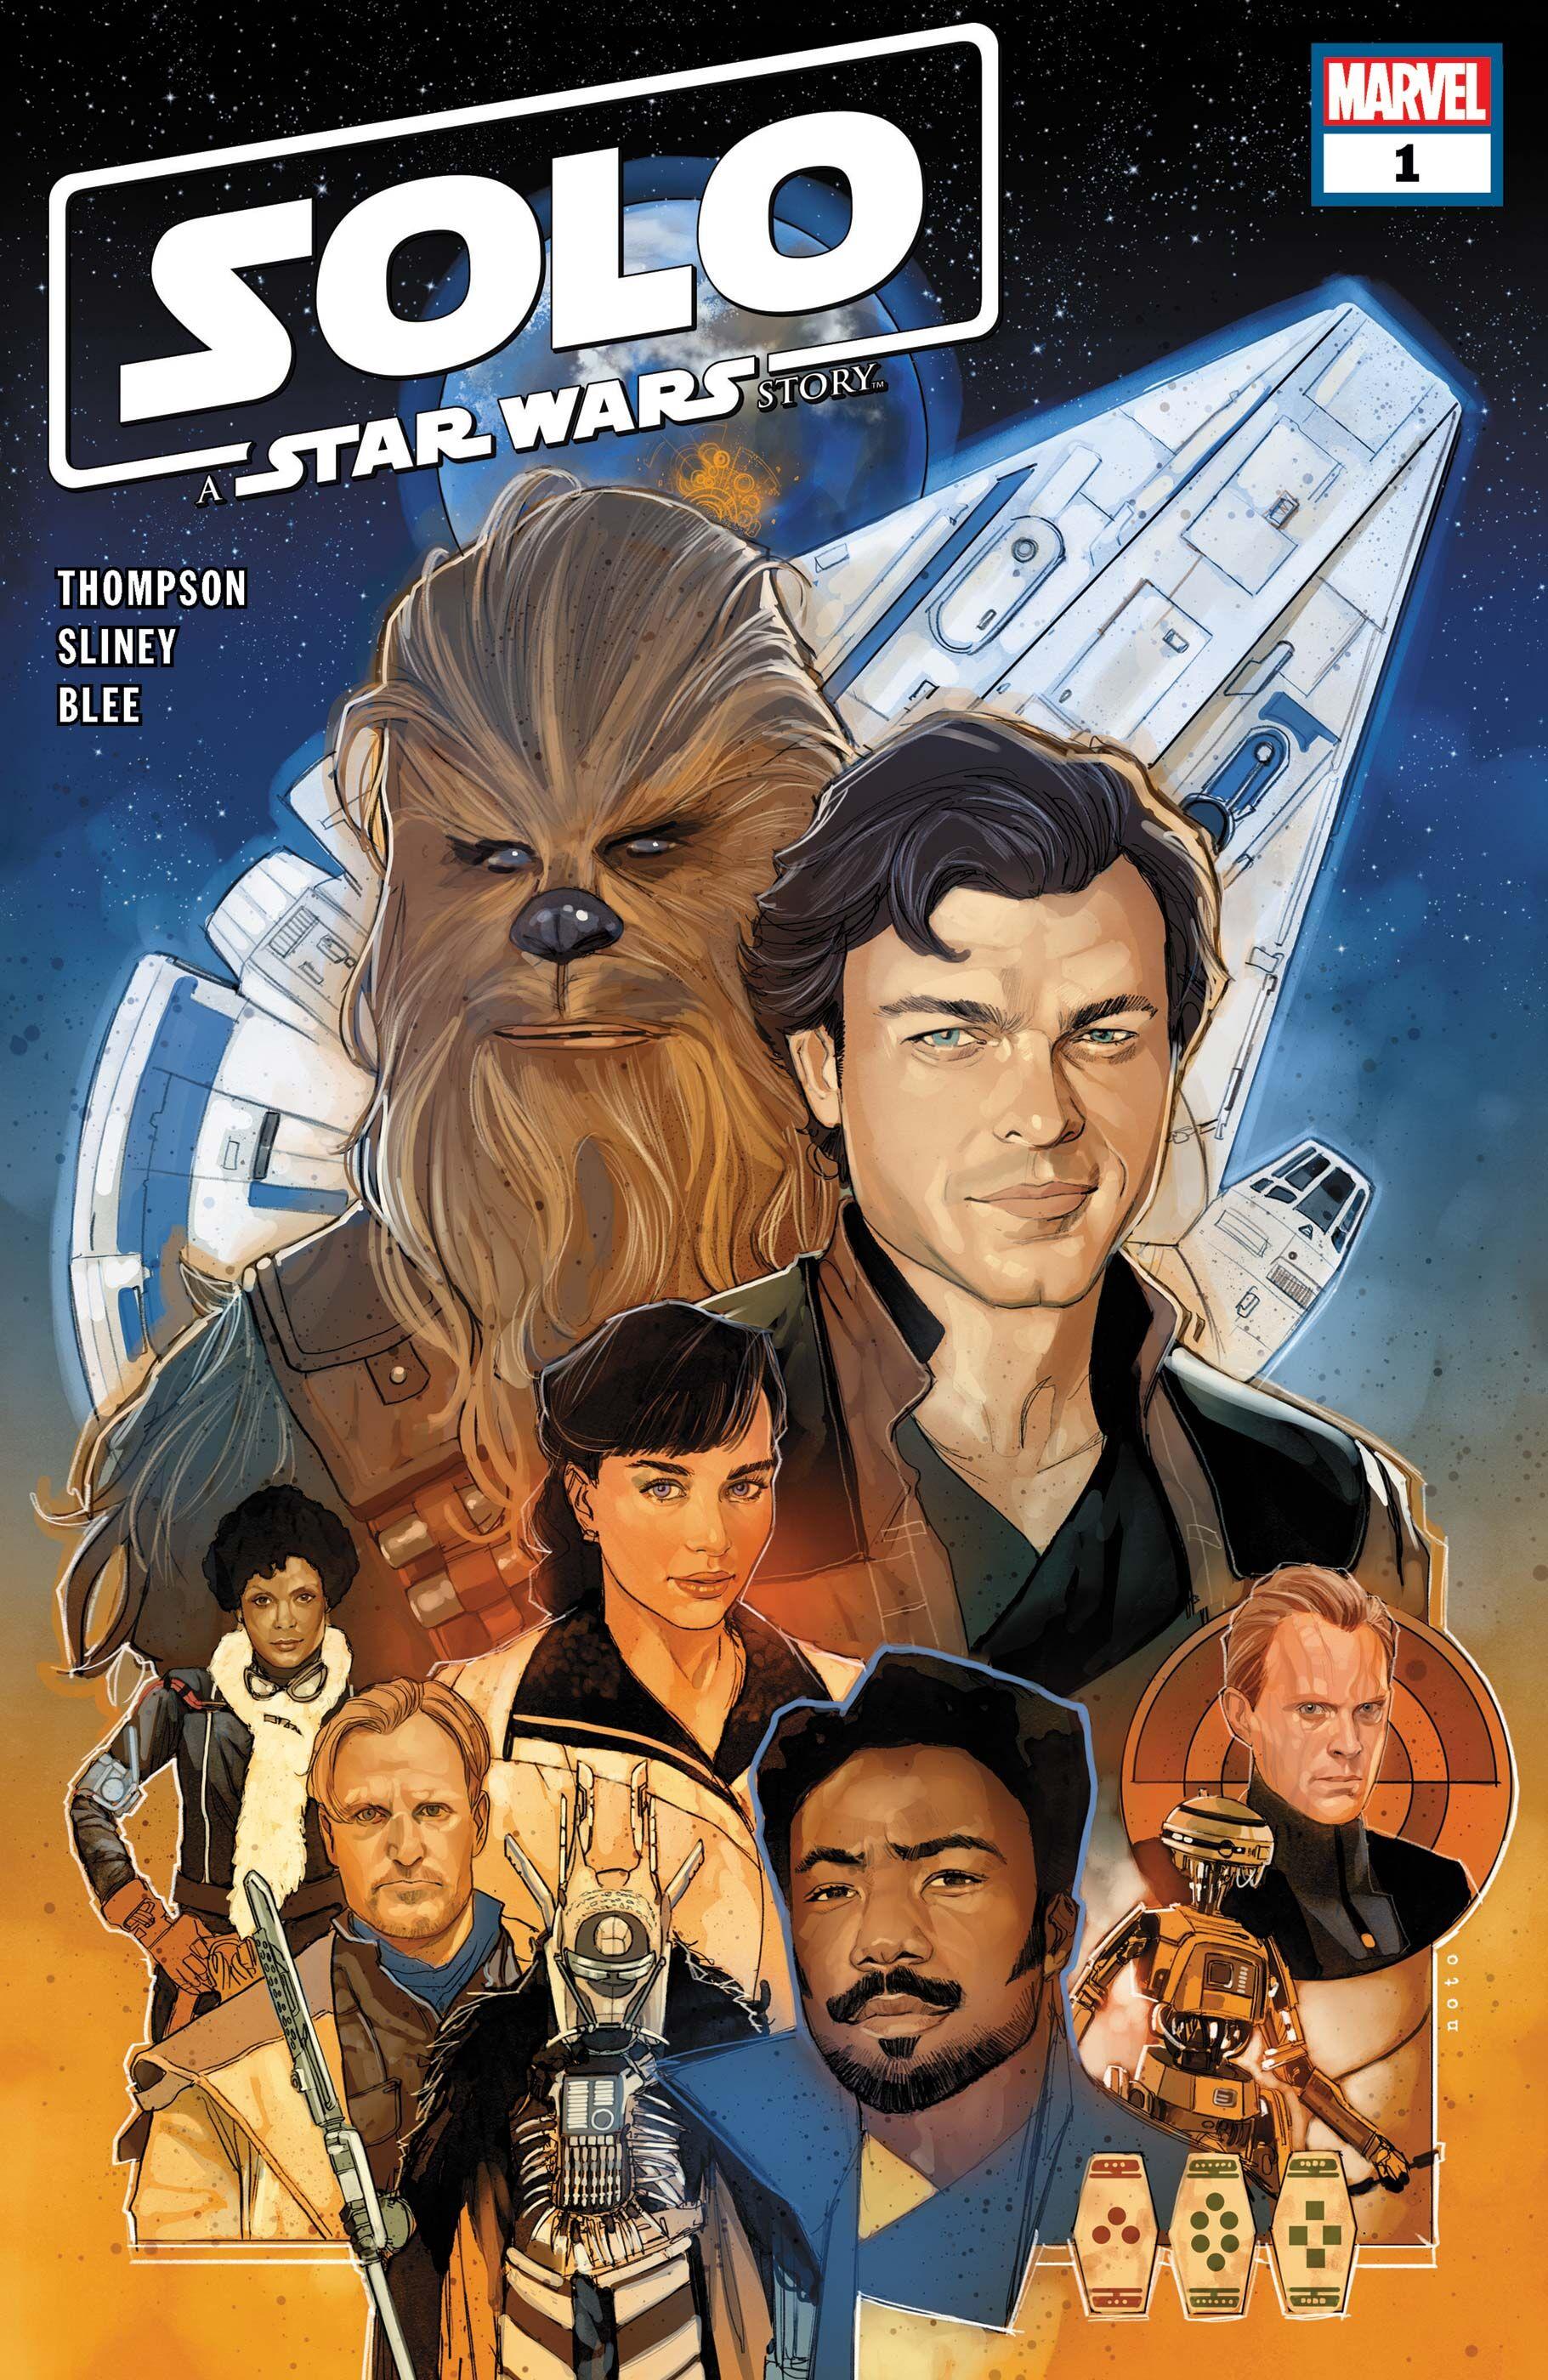 Star Wars comics: Solo: A Star Wars Story adaptation new this week